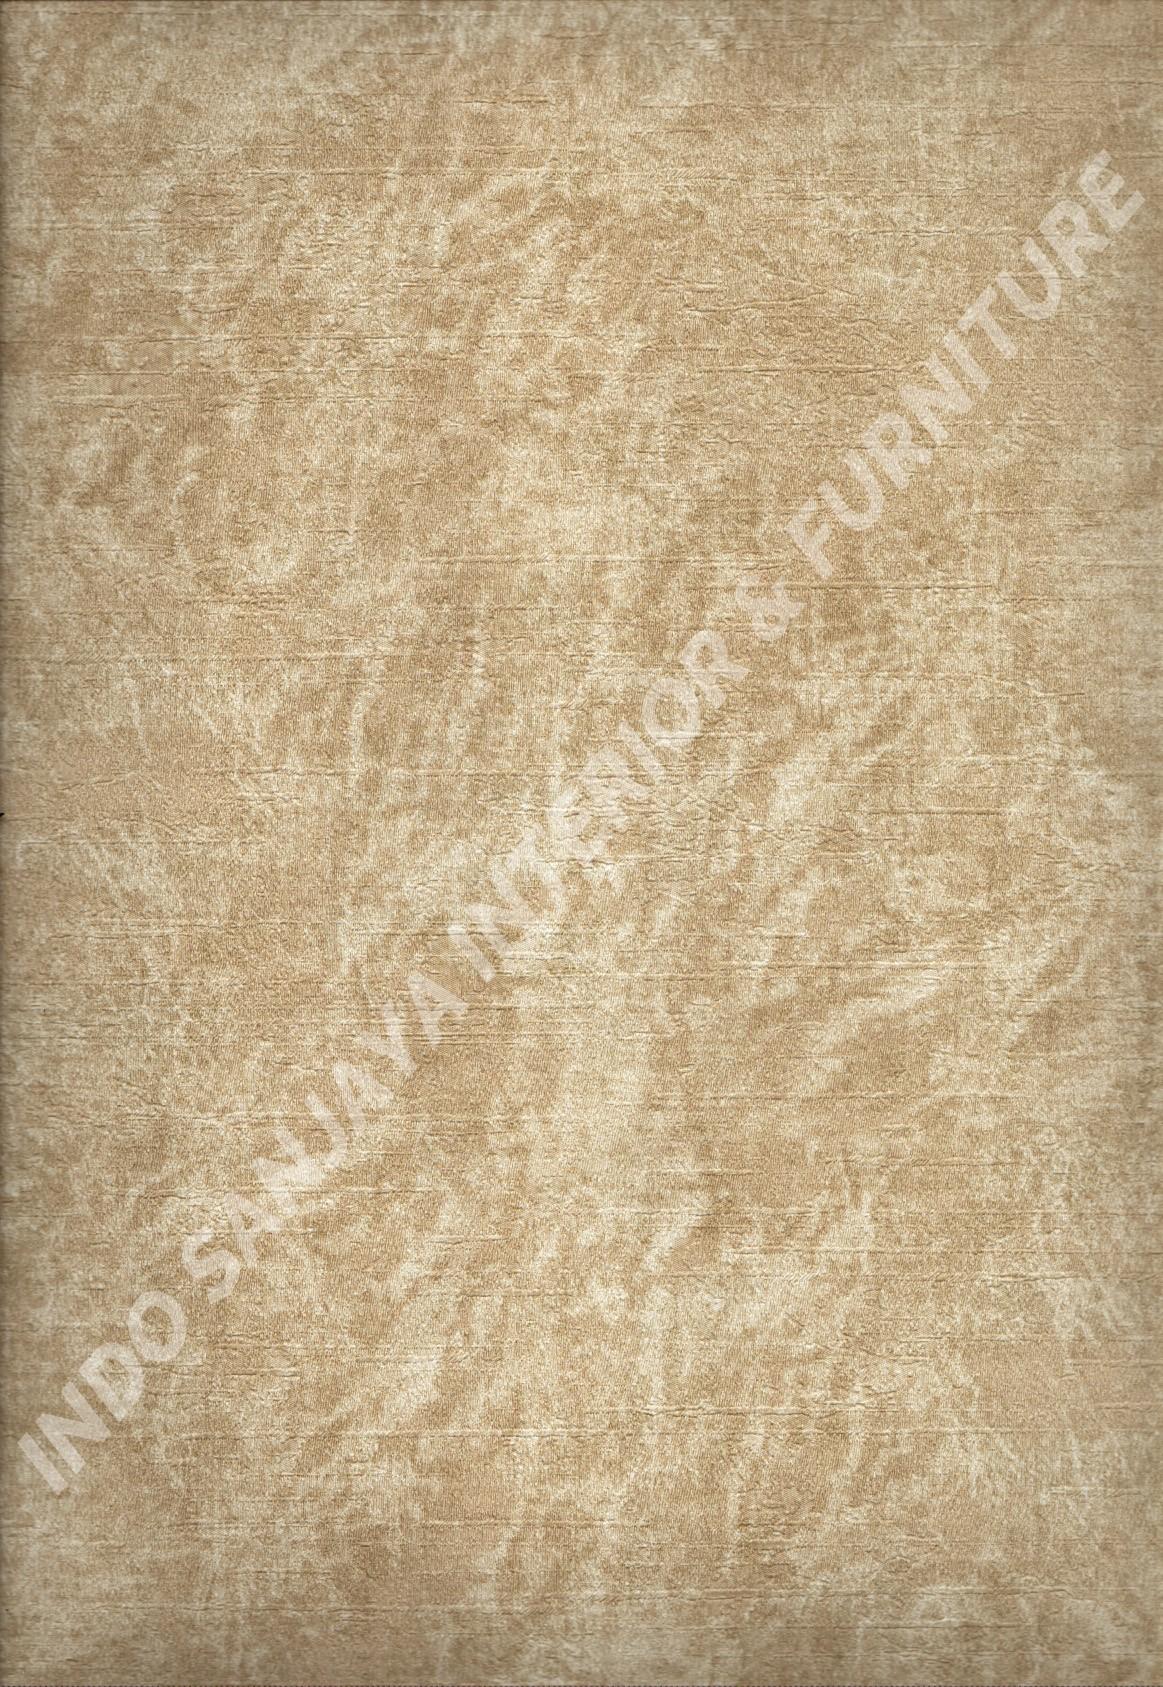 wallpaper   Wallpaper Minimalis Polos 8844:8844 corak  warna